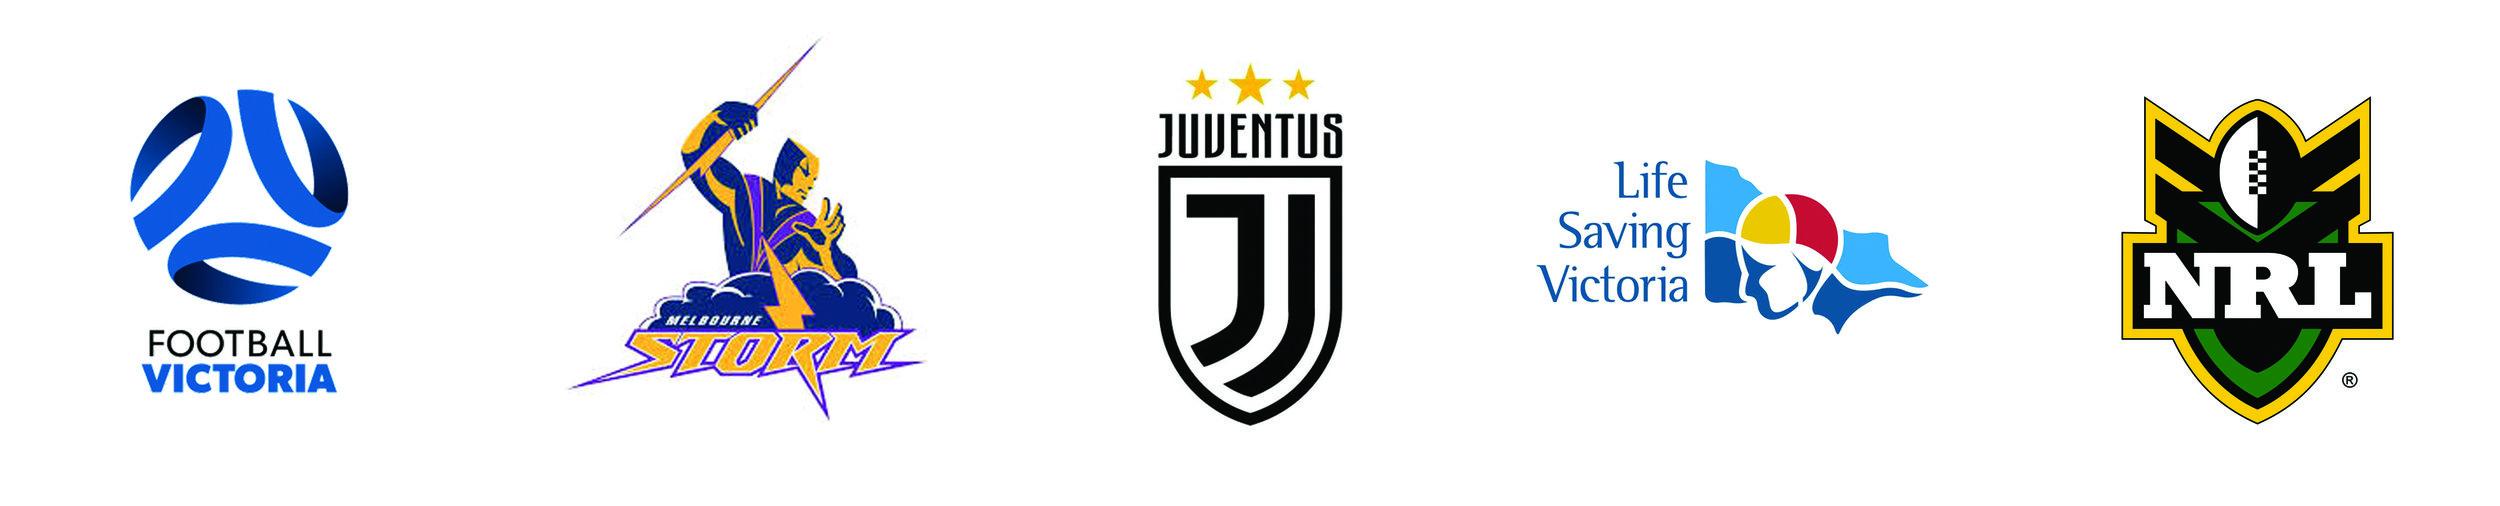 Sport - 3 - All services - new logos.jpg